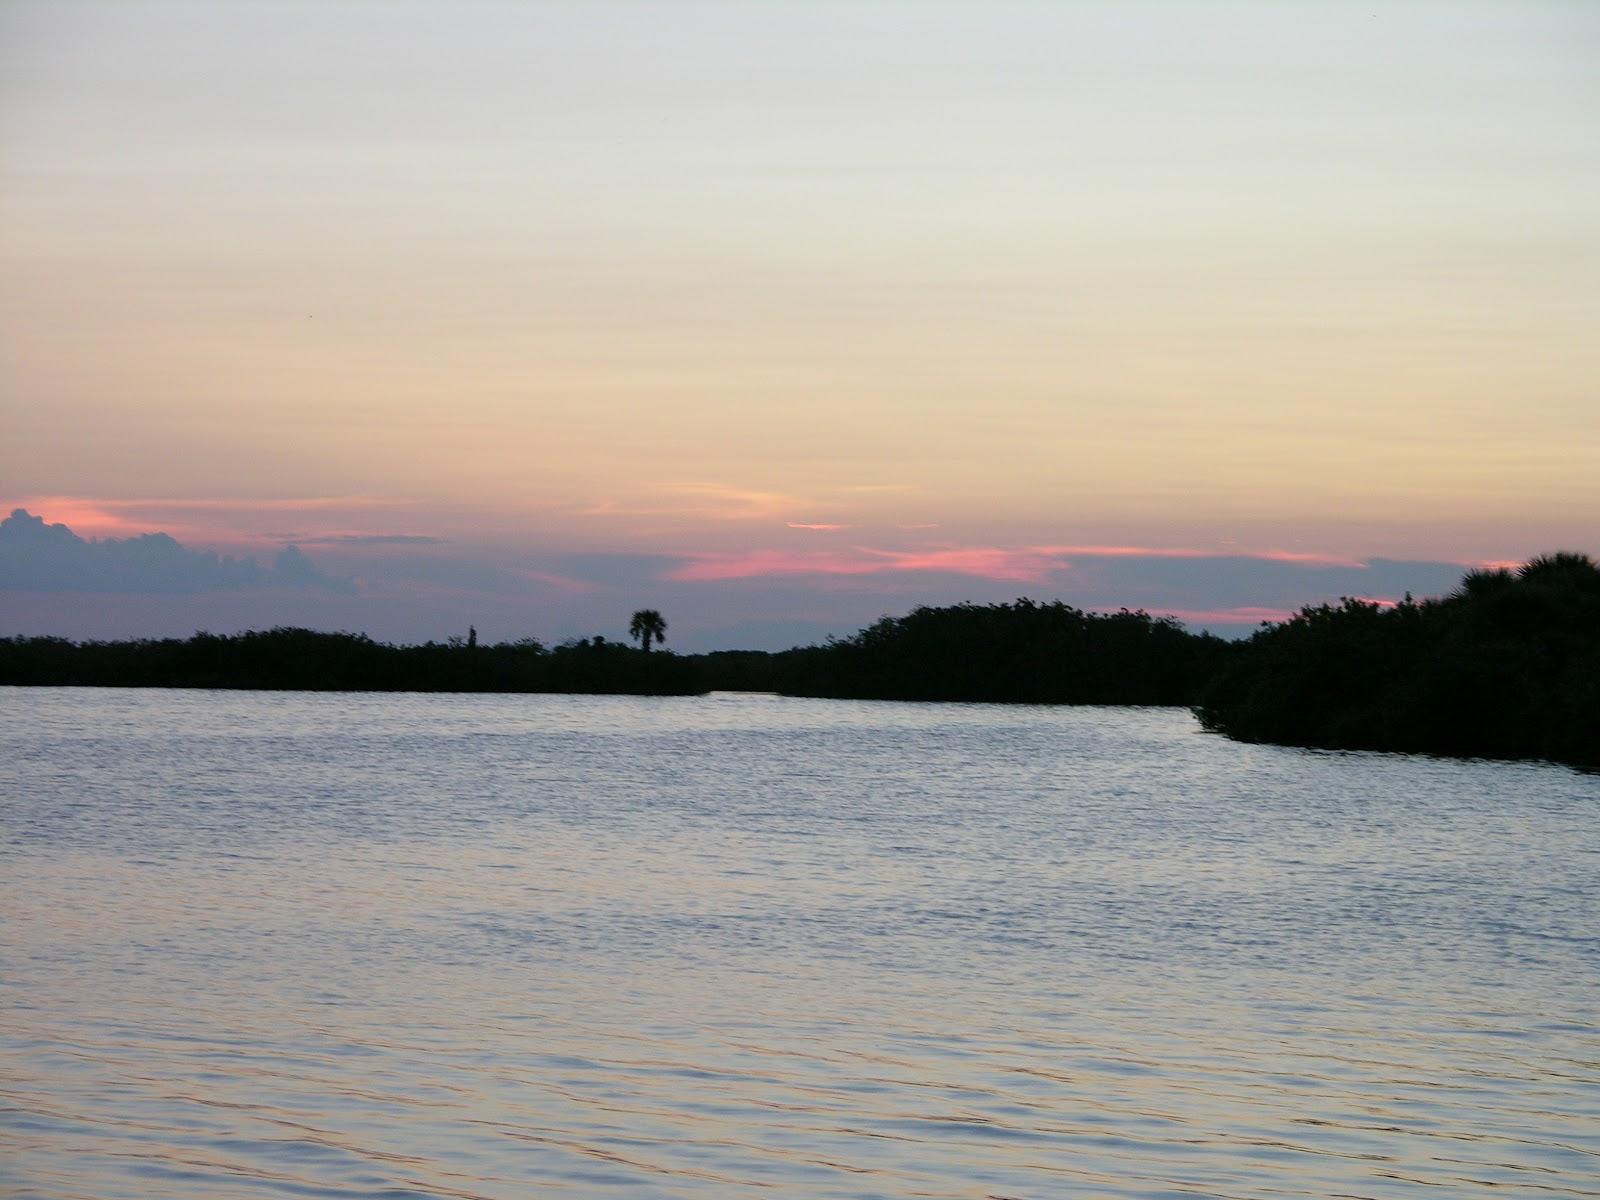 sunset at Mosquito Lagoon